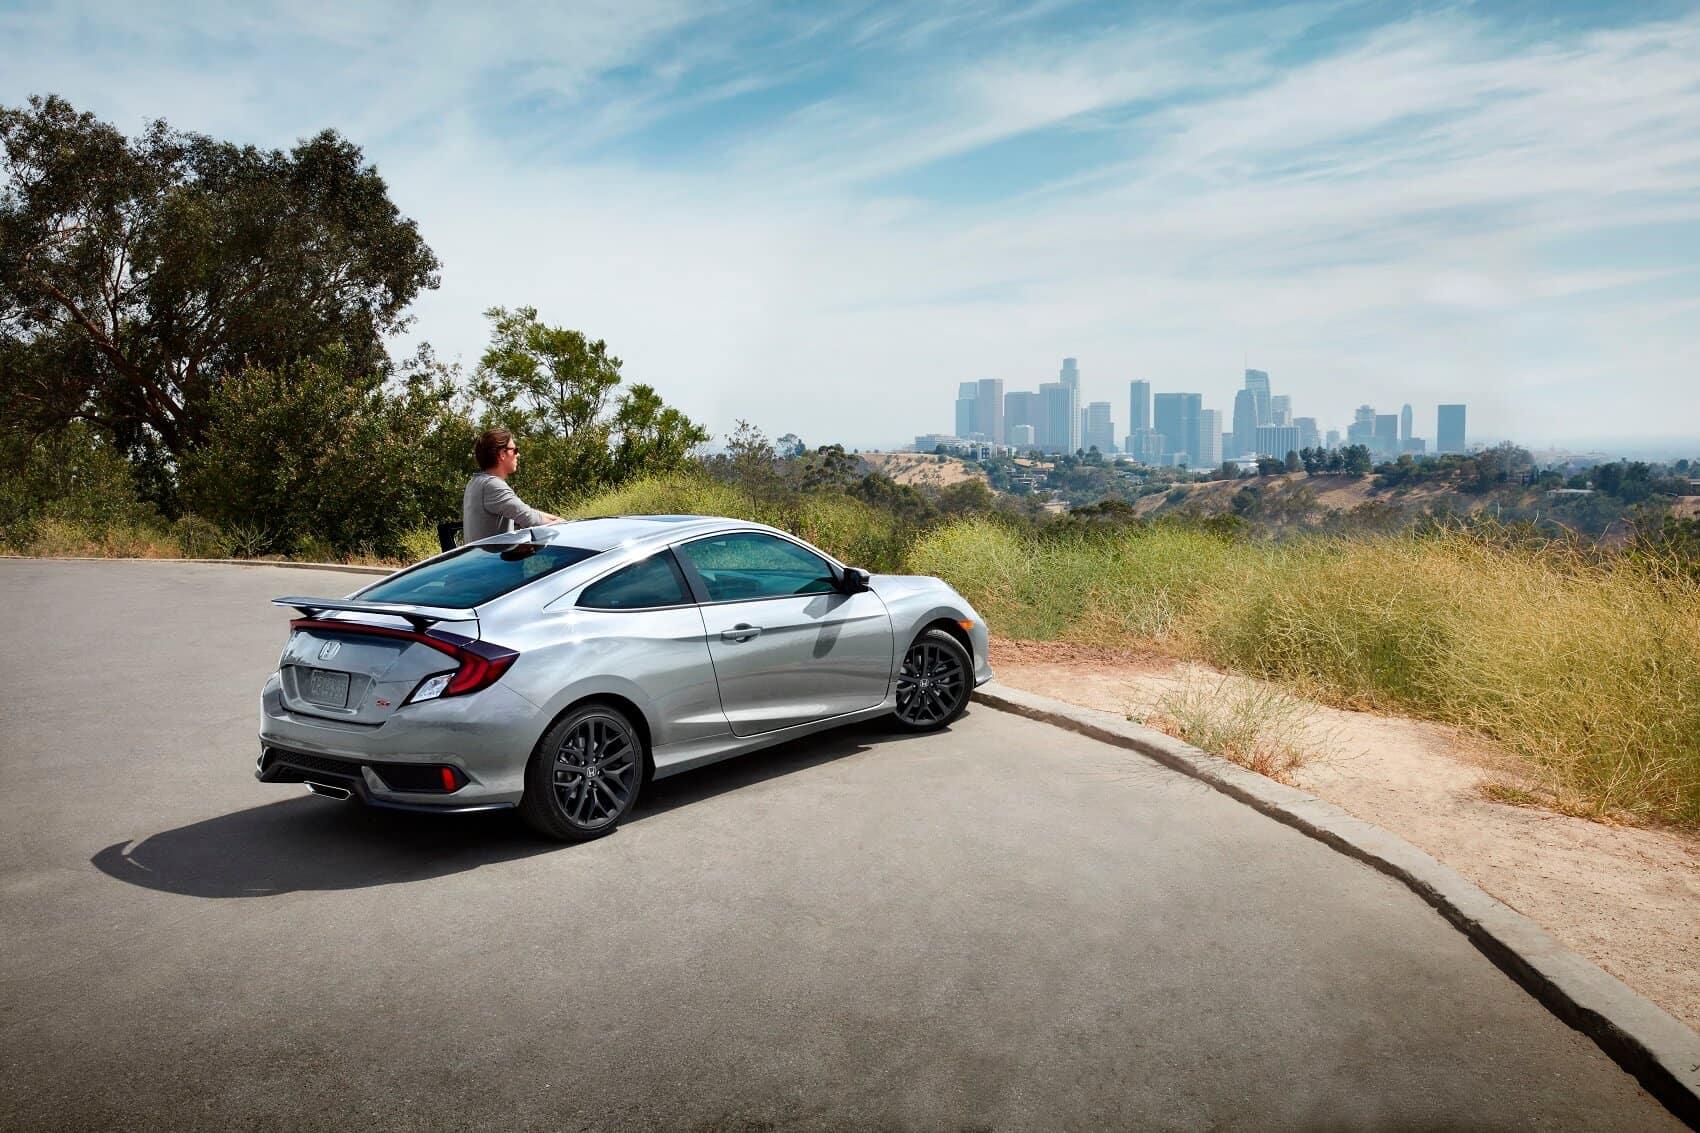 Honda Civic Engine Options